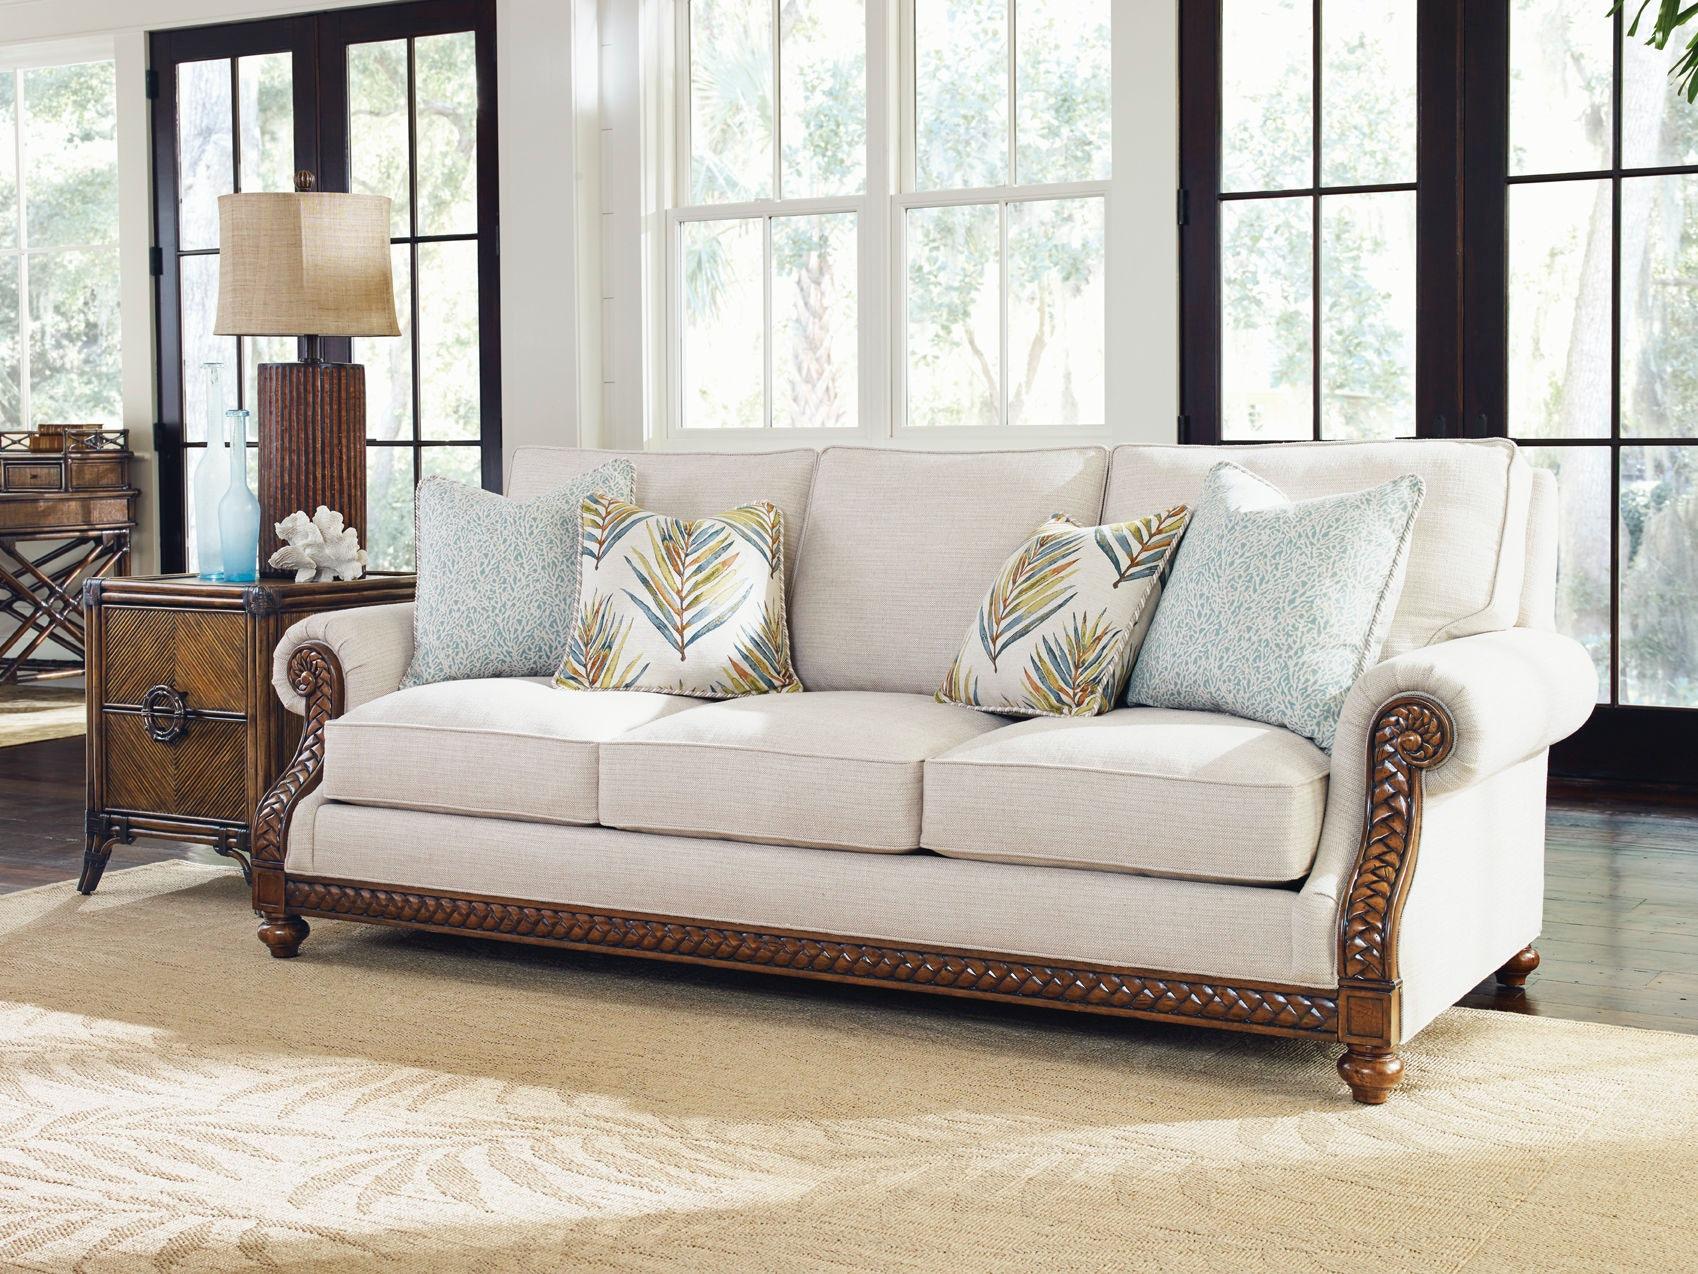 tommy bahama living room nice chairs home shoreline sofa 7844 33 02 bacons